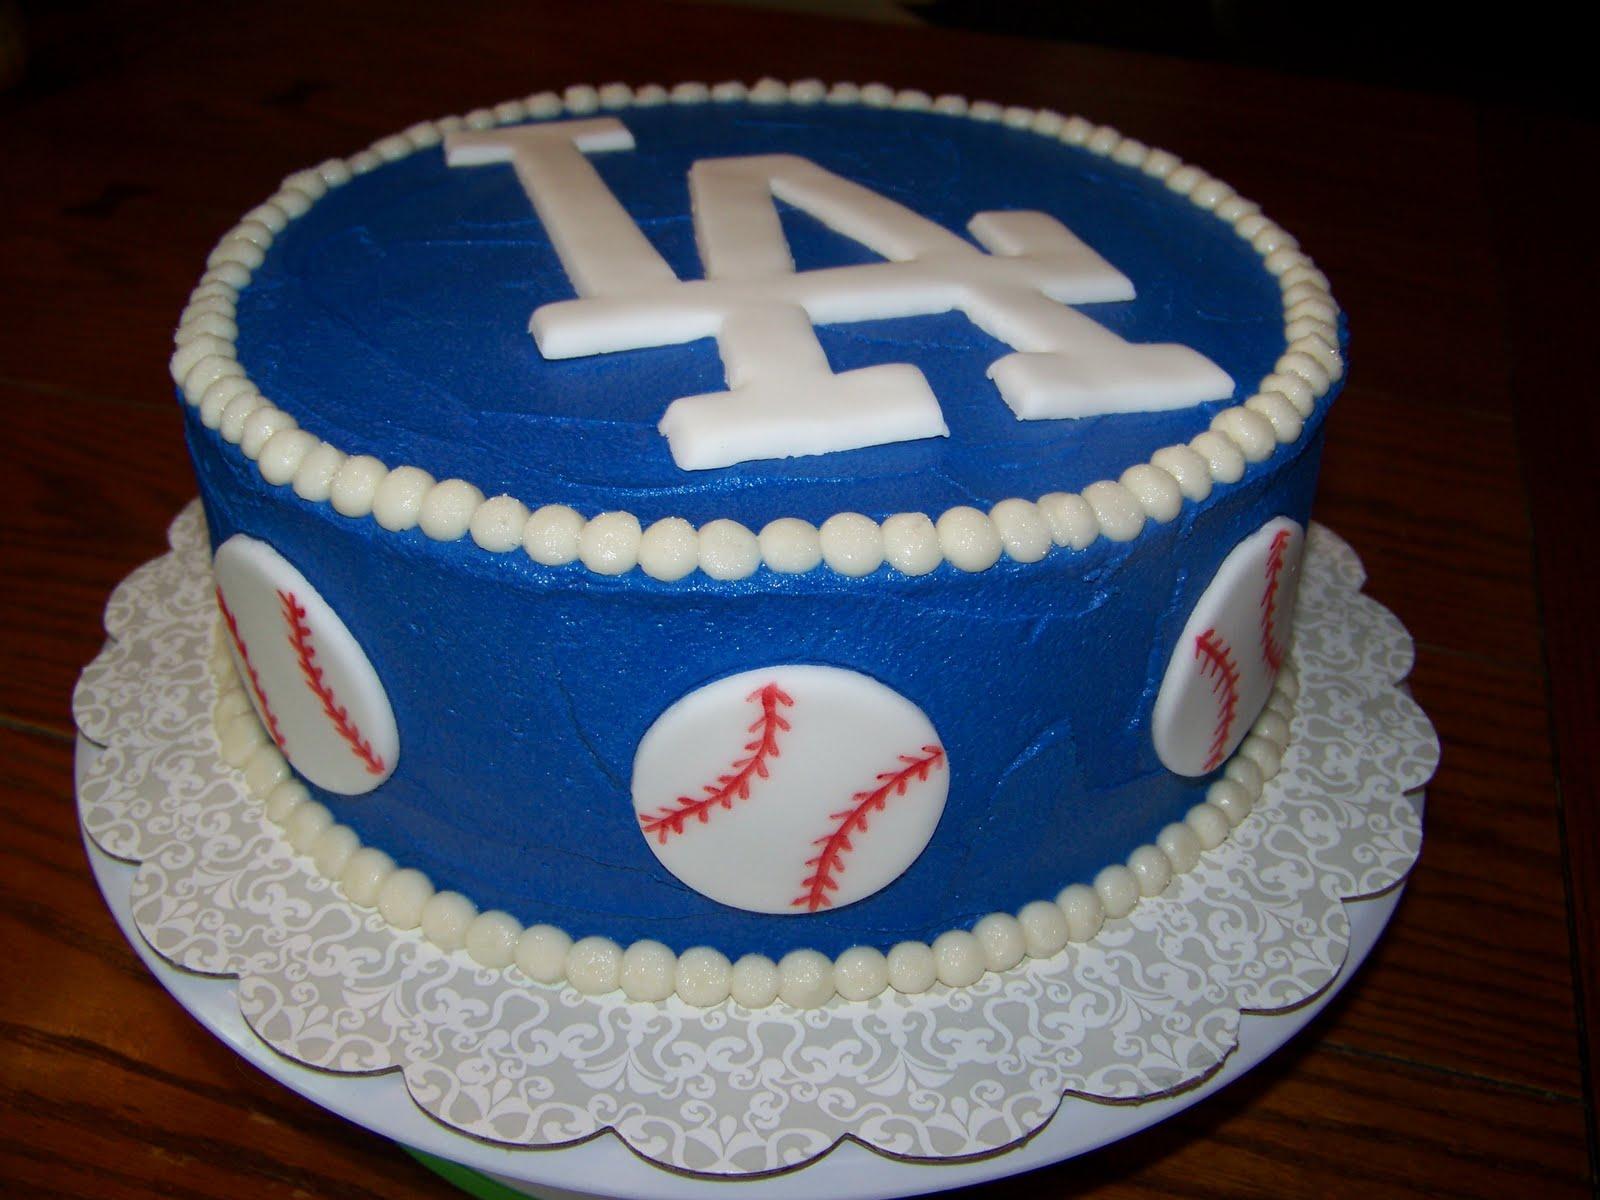 Plumeria Cake Studio: Dodger Cake